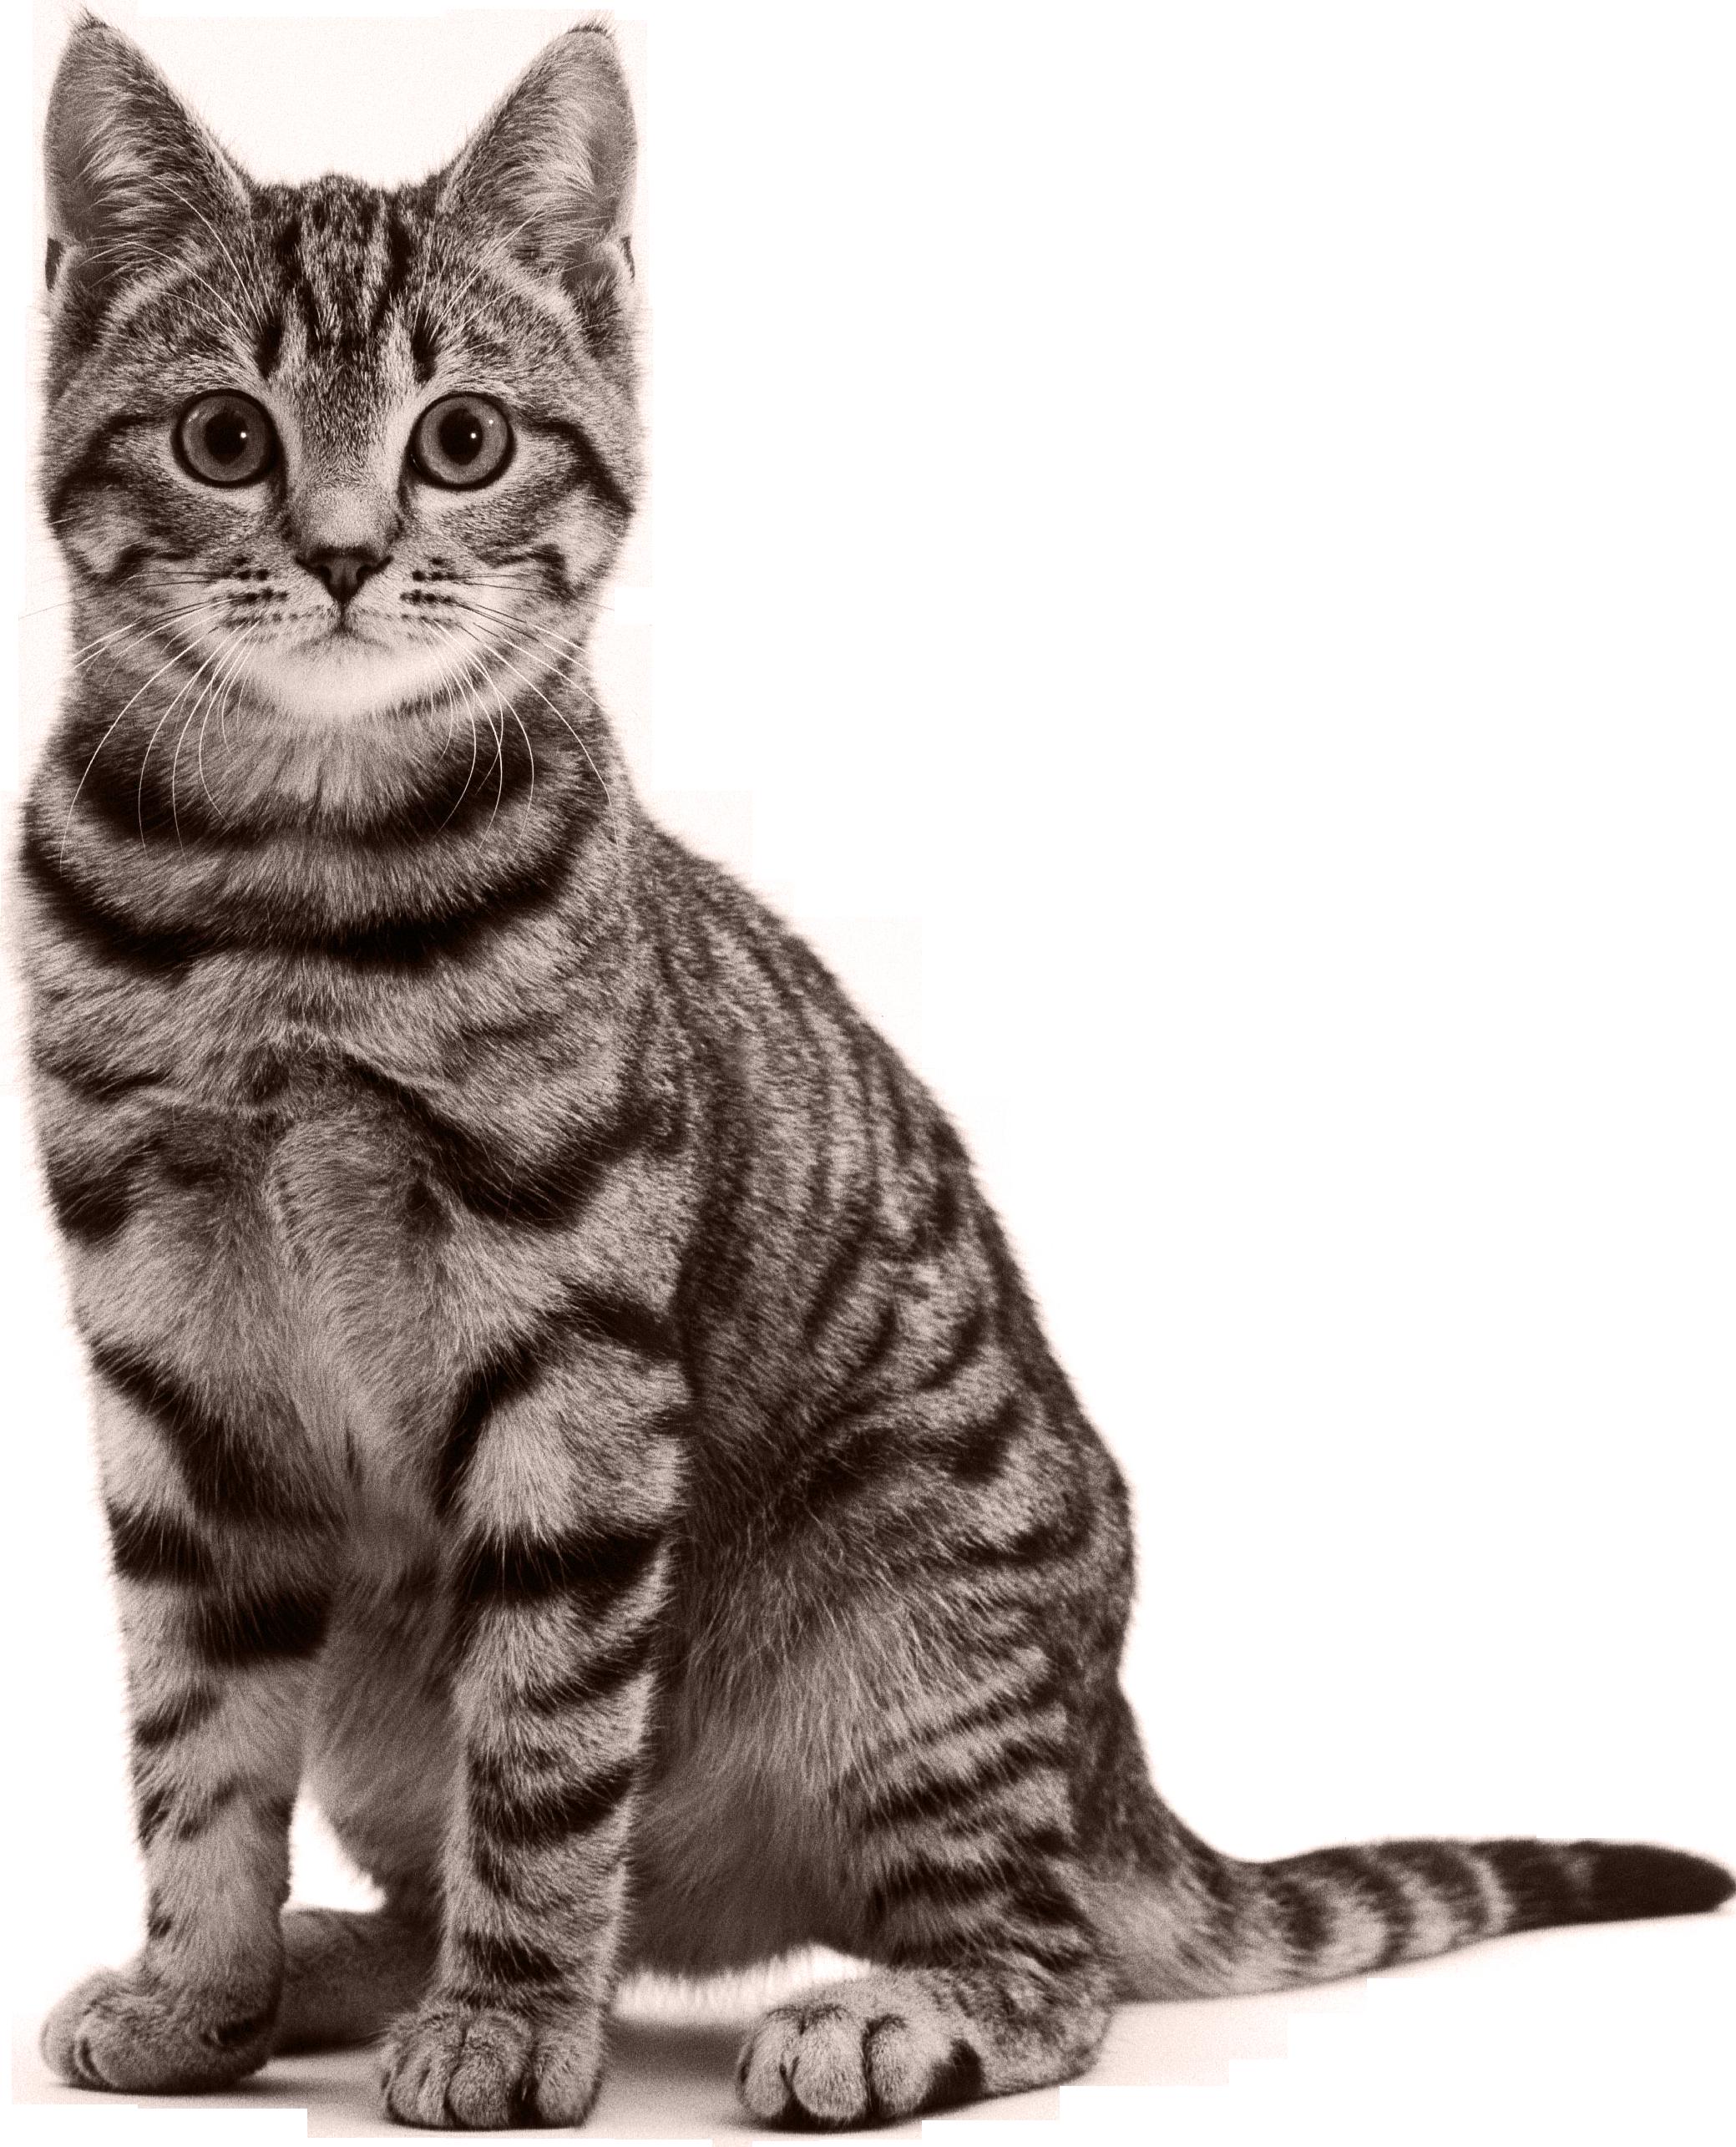 Not cat urls txt. Kittens clipart catl